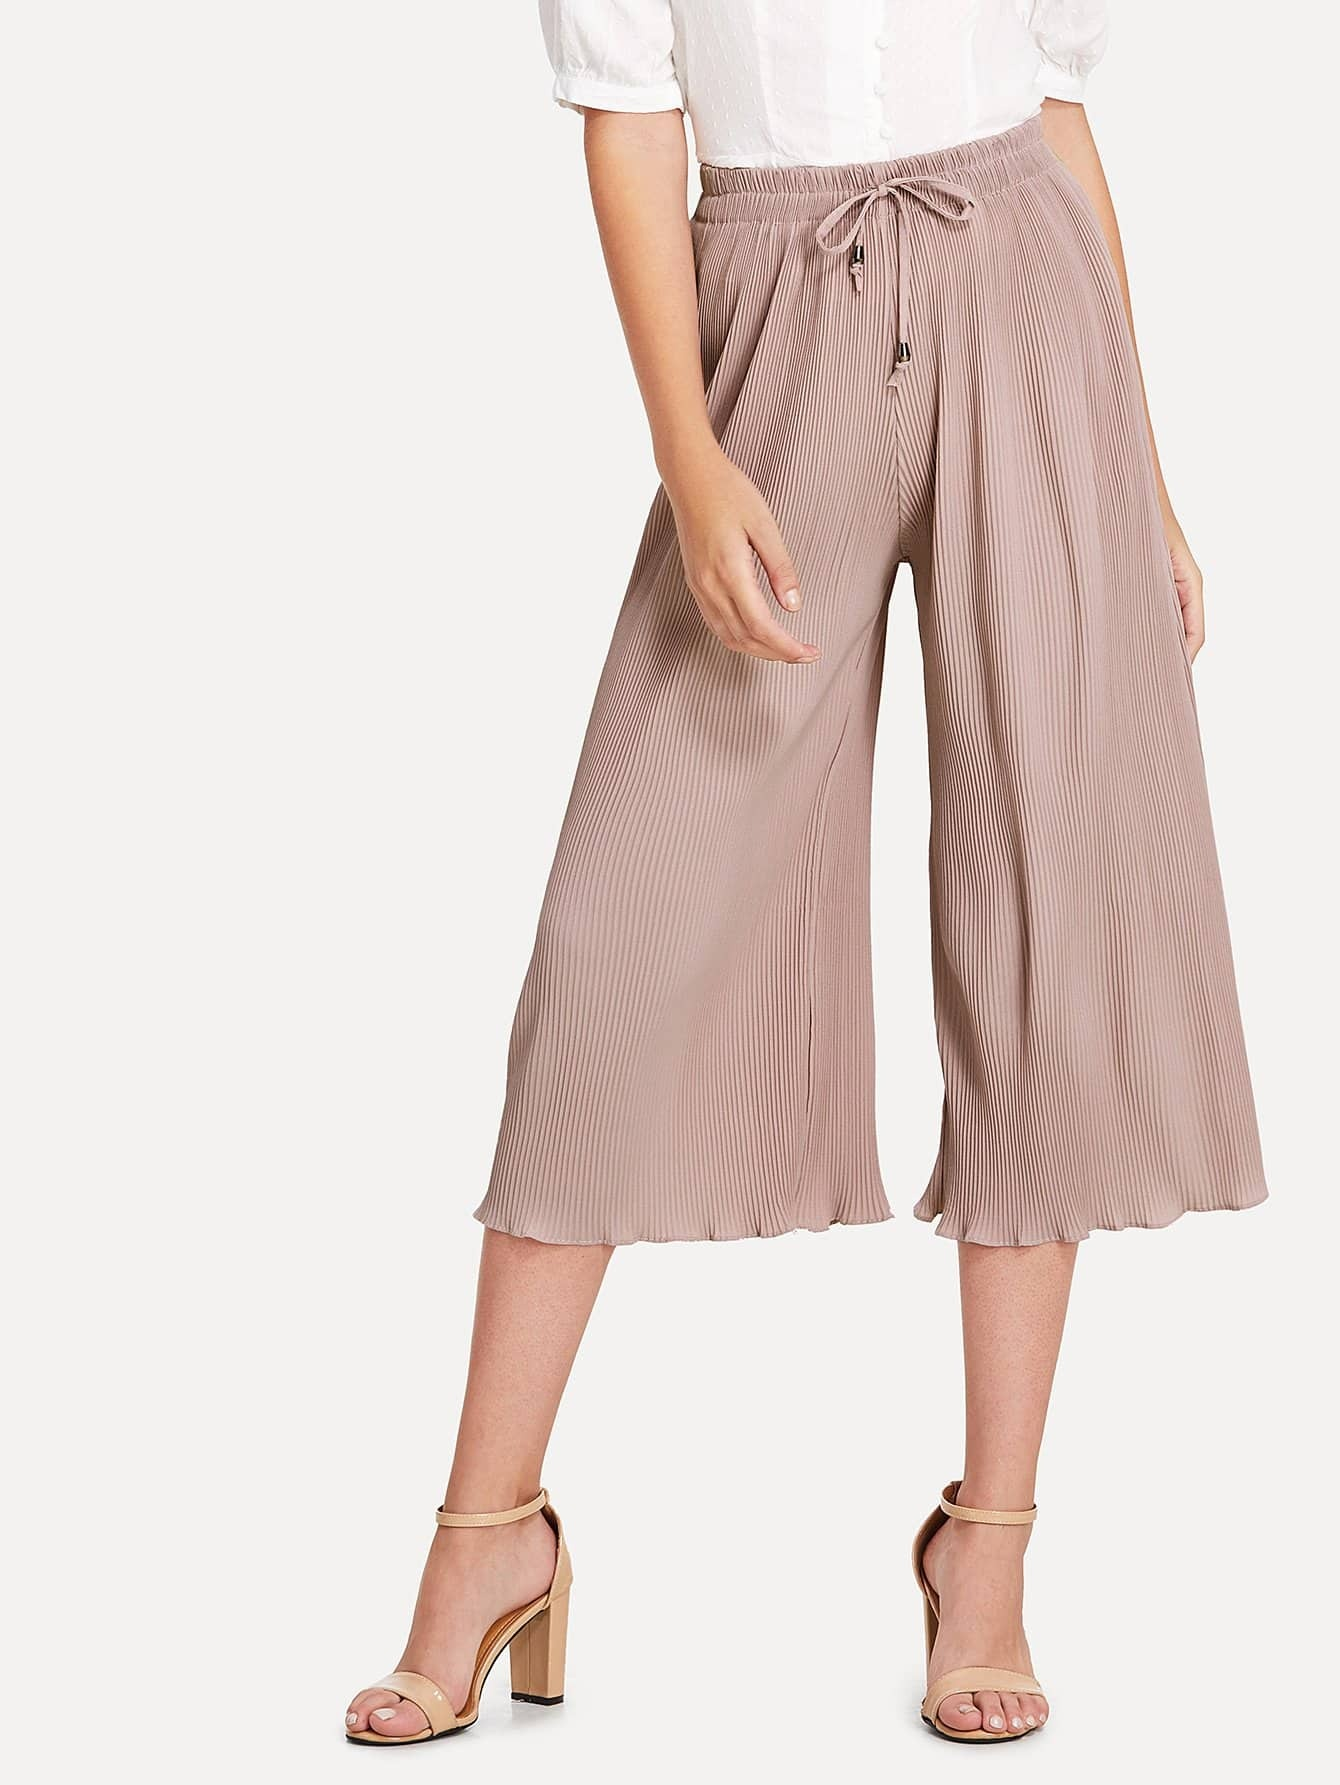 Drawstring Waist Wide Leg Pants floral wide leg drawstring pants